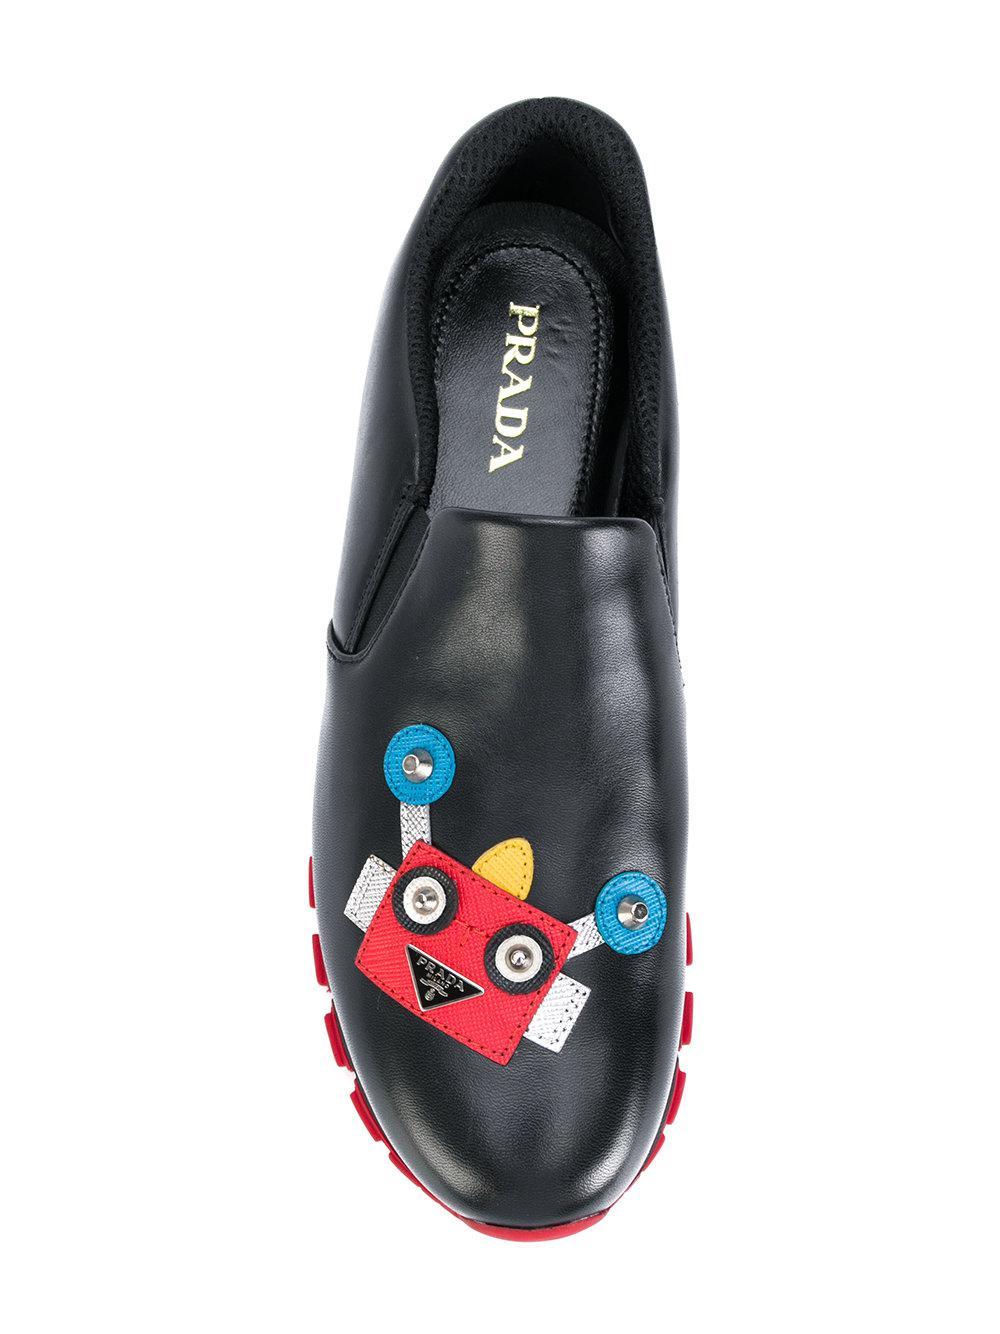 Prada Sneakers Decorate Con Robot in Black